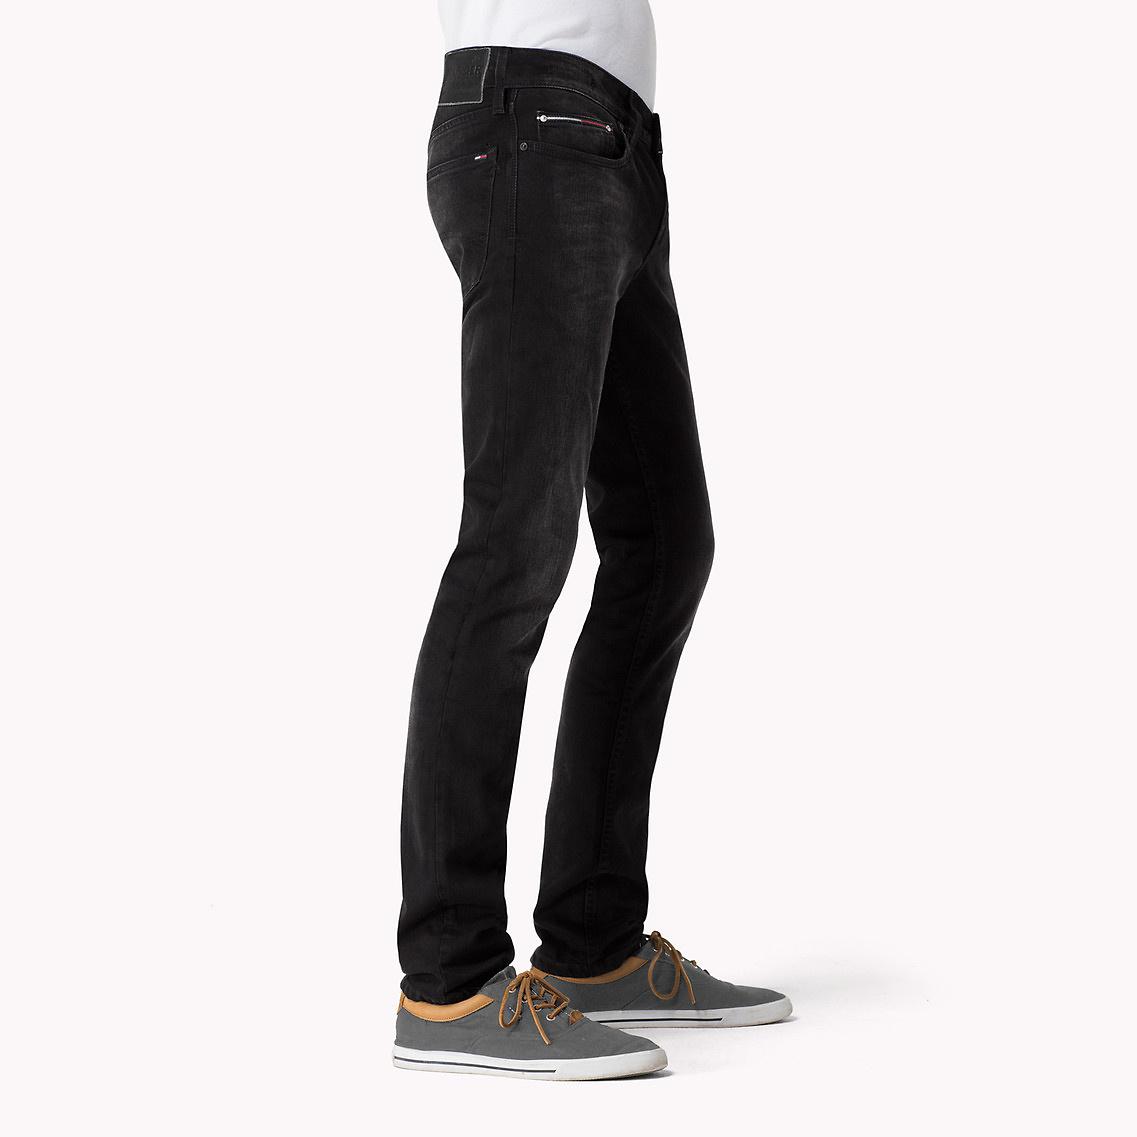 52e6e5269605f2 Tommy Hilfiger Sidney Skinny Fit Jeans in Black for Men - Lyst